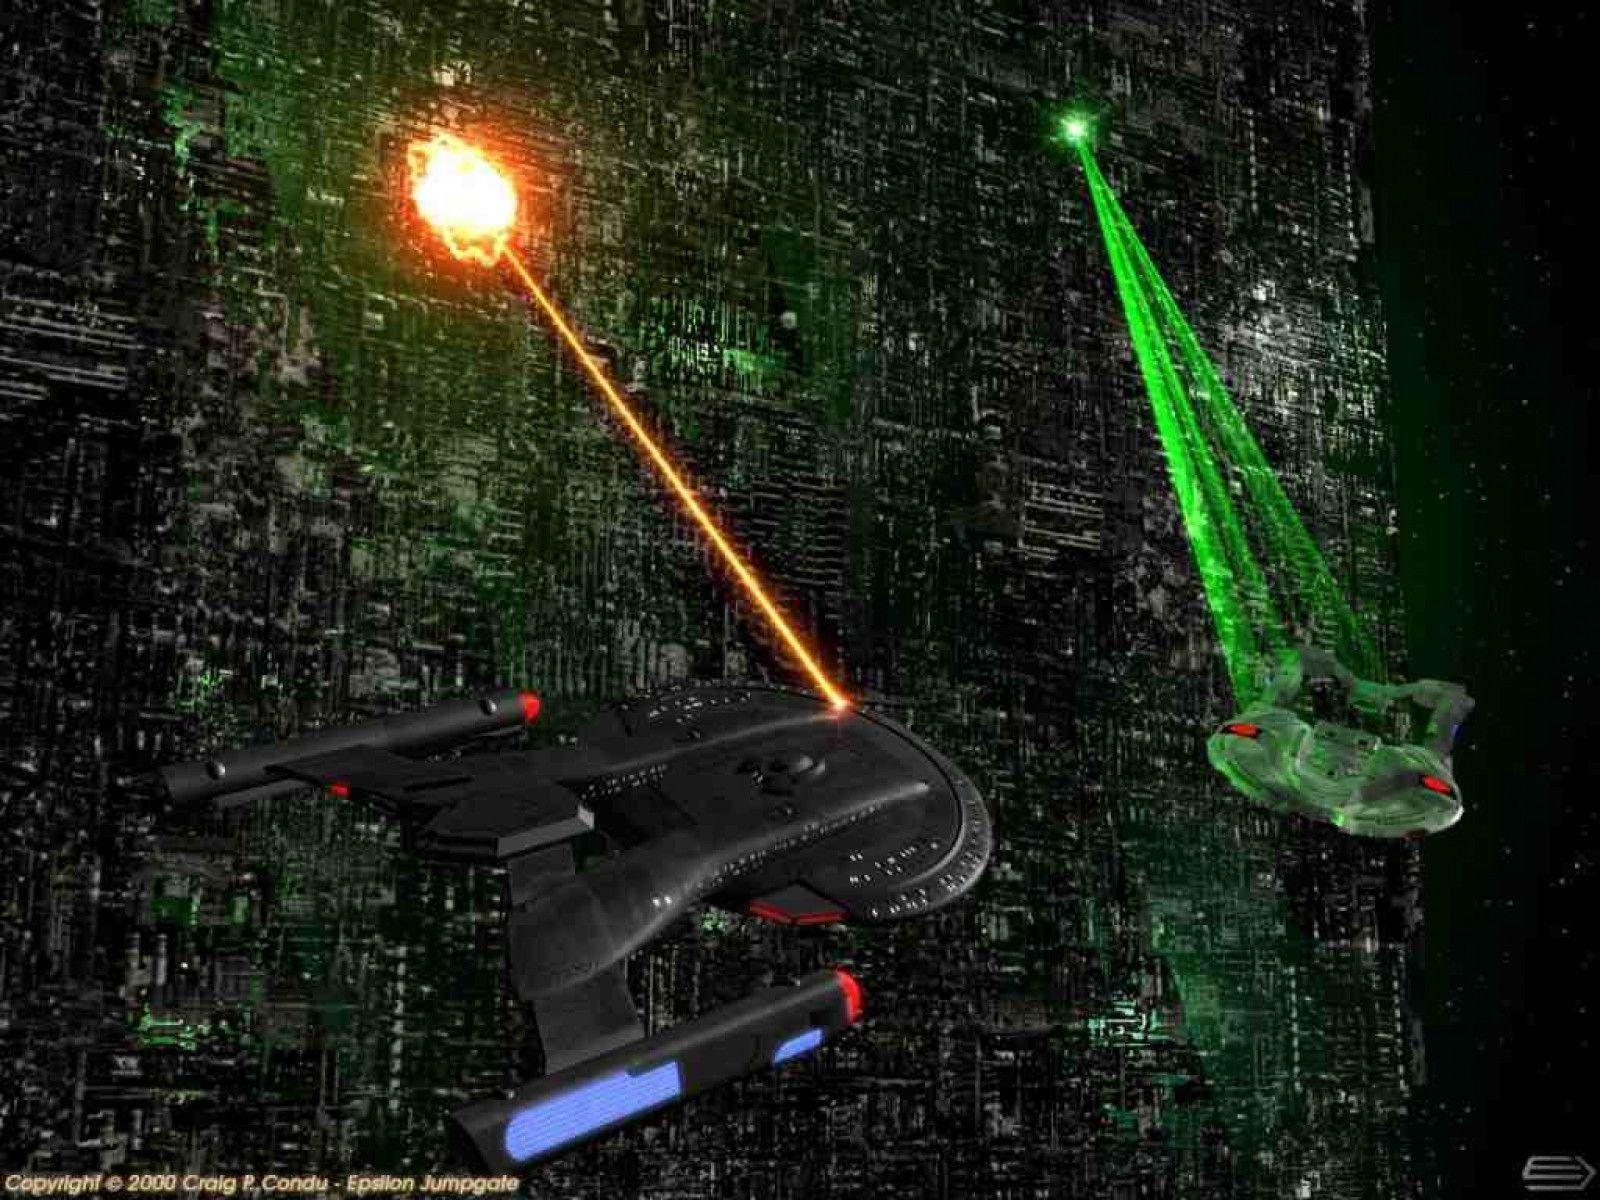 3d Image Live Wallpaper Android App Star Trek Borg Wallpapers Wallpaper Cave